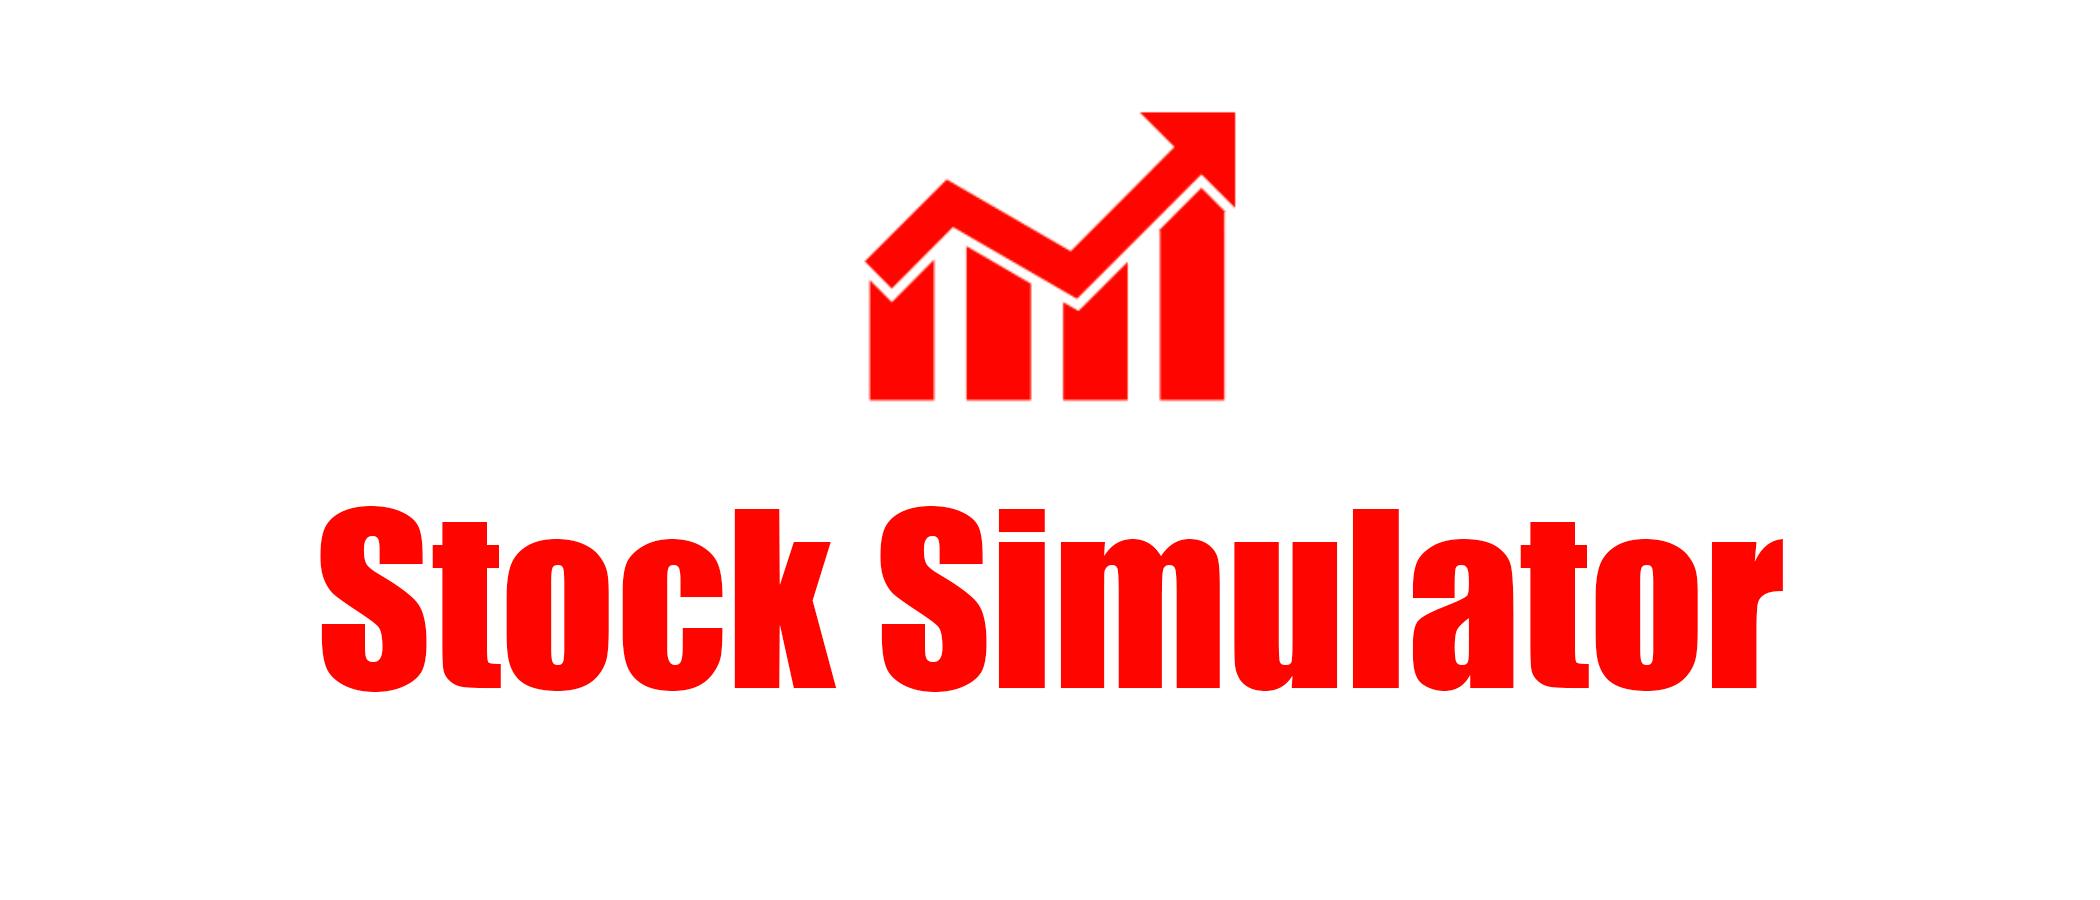 Stock Simulator